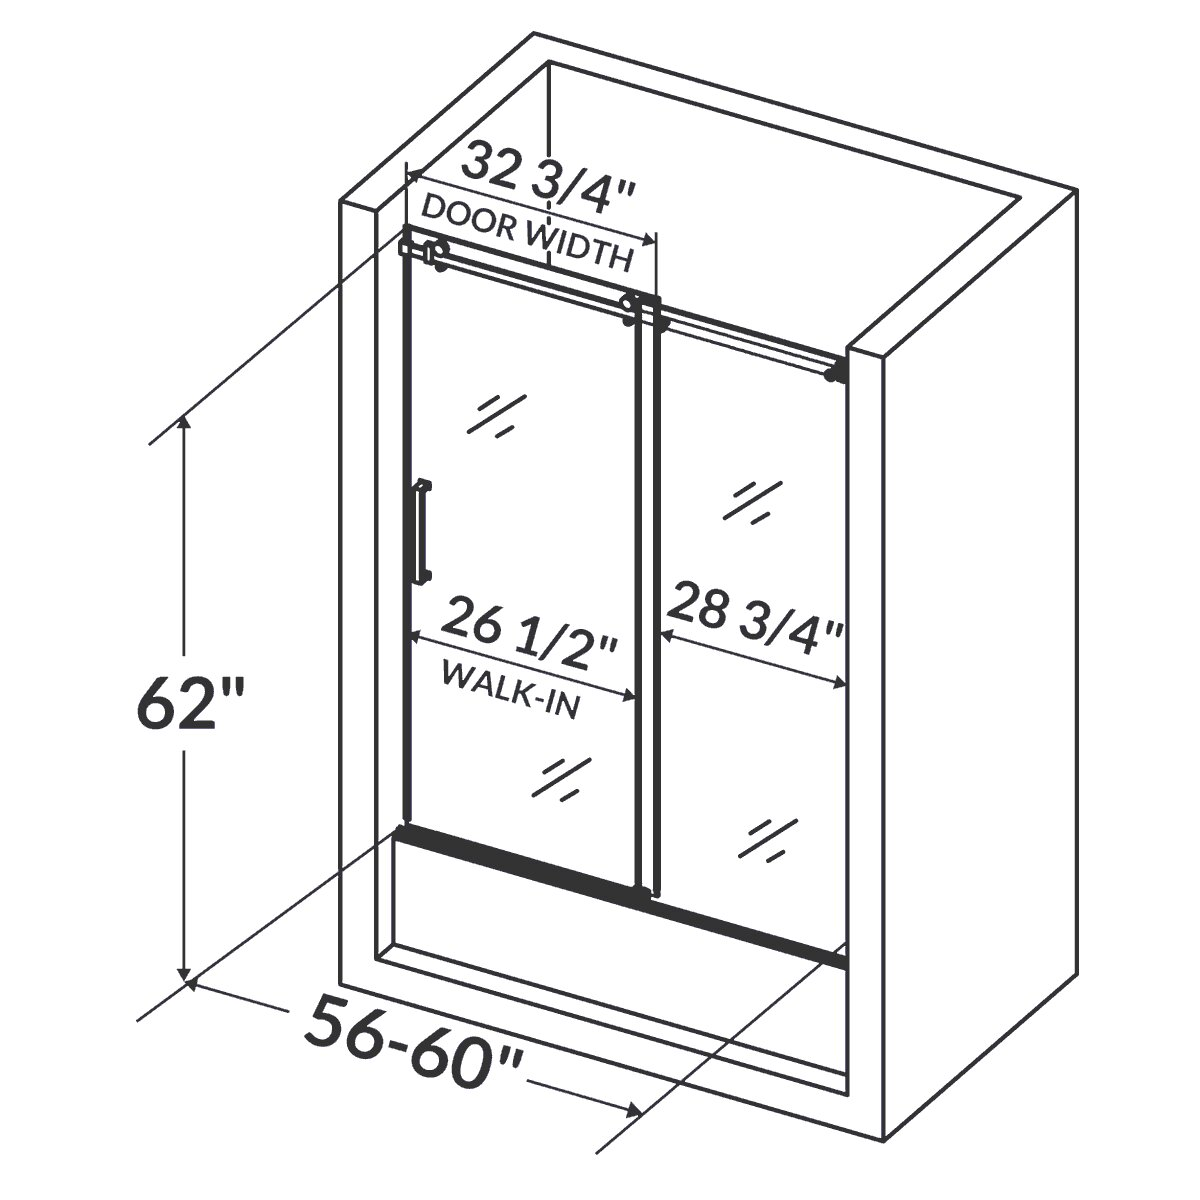 Lesscare clear glass shower door ultra b 44 48 wide x 76 high chrome - 12004759194955841200 Ultra B 62 X 60 Sliding Glass Bath Tub Door Reviews W 636269